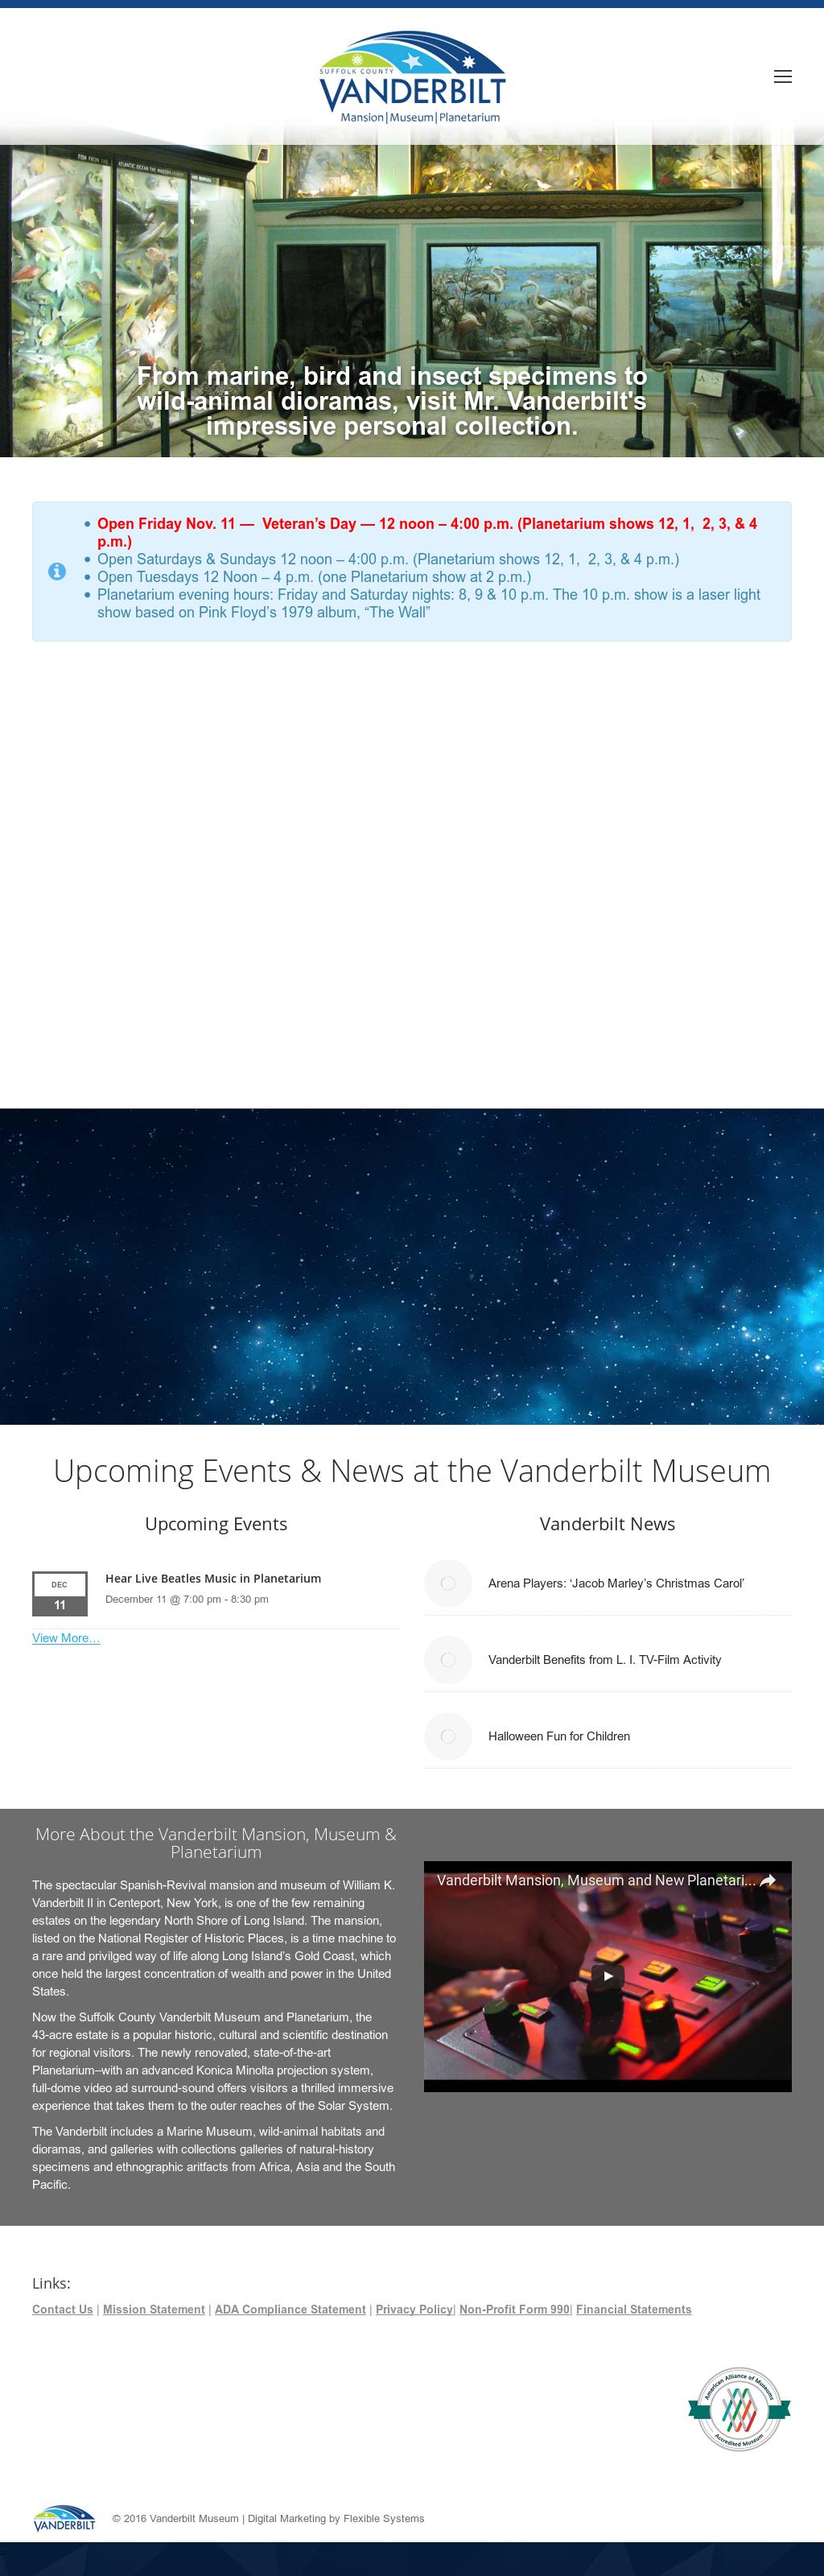 Vanderbilt Museum Competitors, Revenue and Employees - Owler